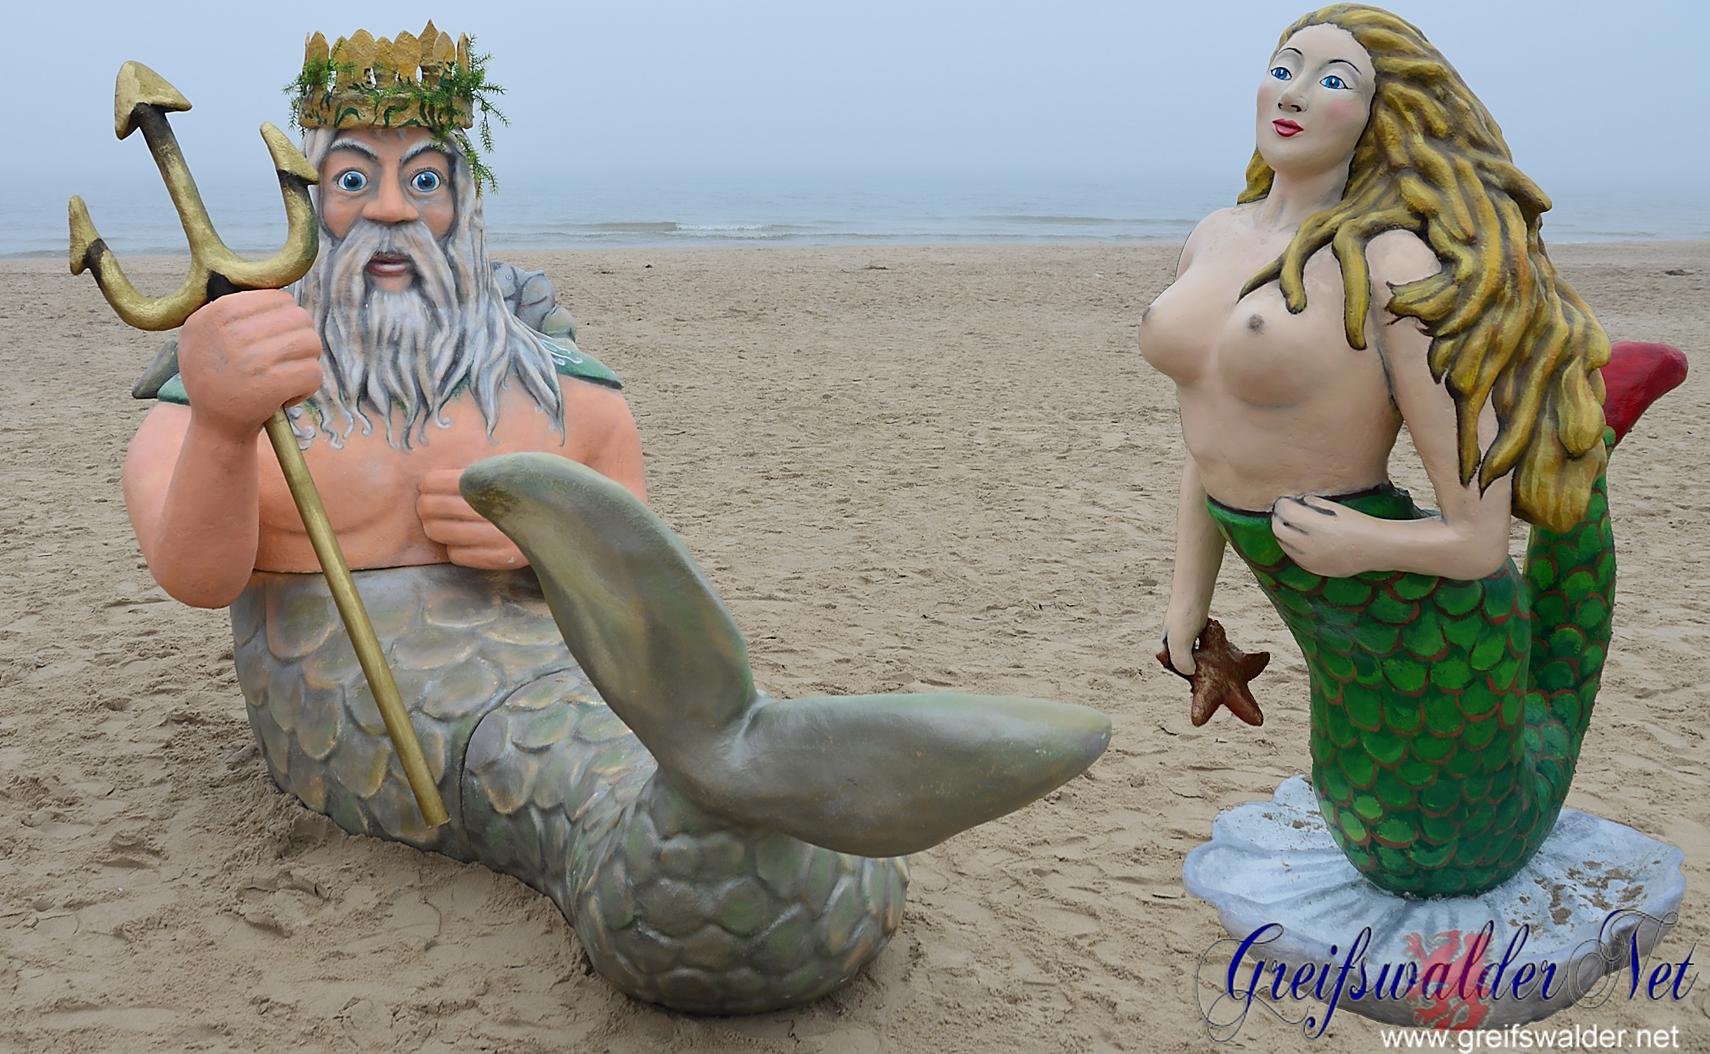 Neptun und Meerjungfrau am Strand